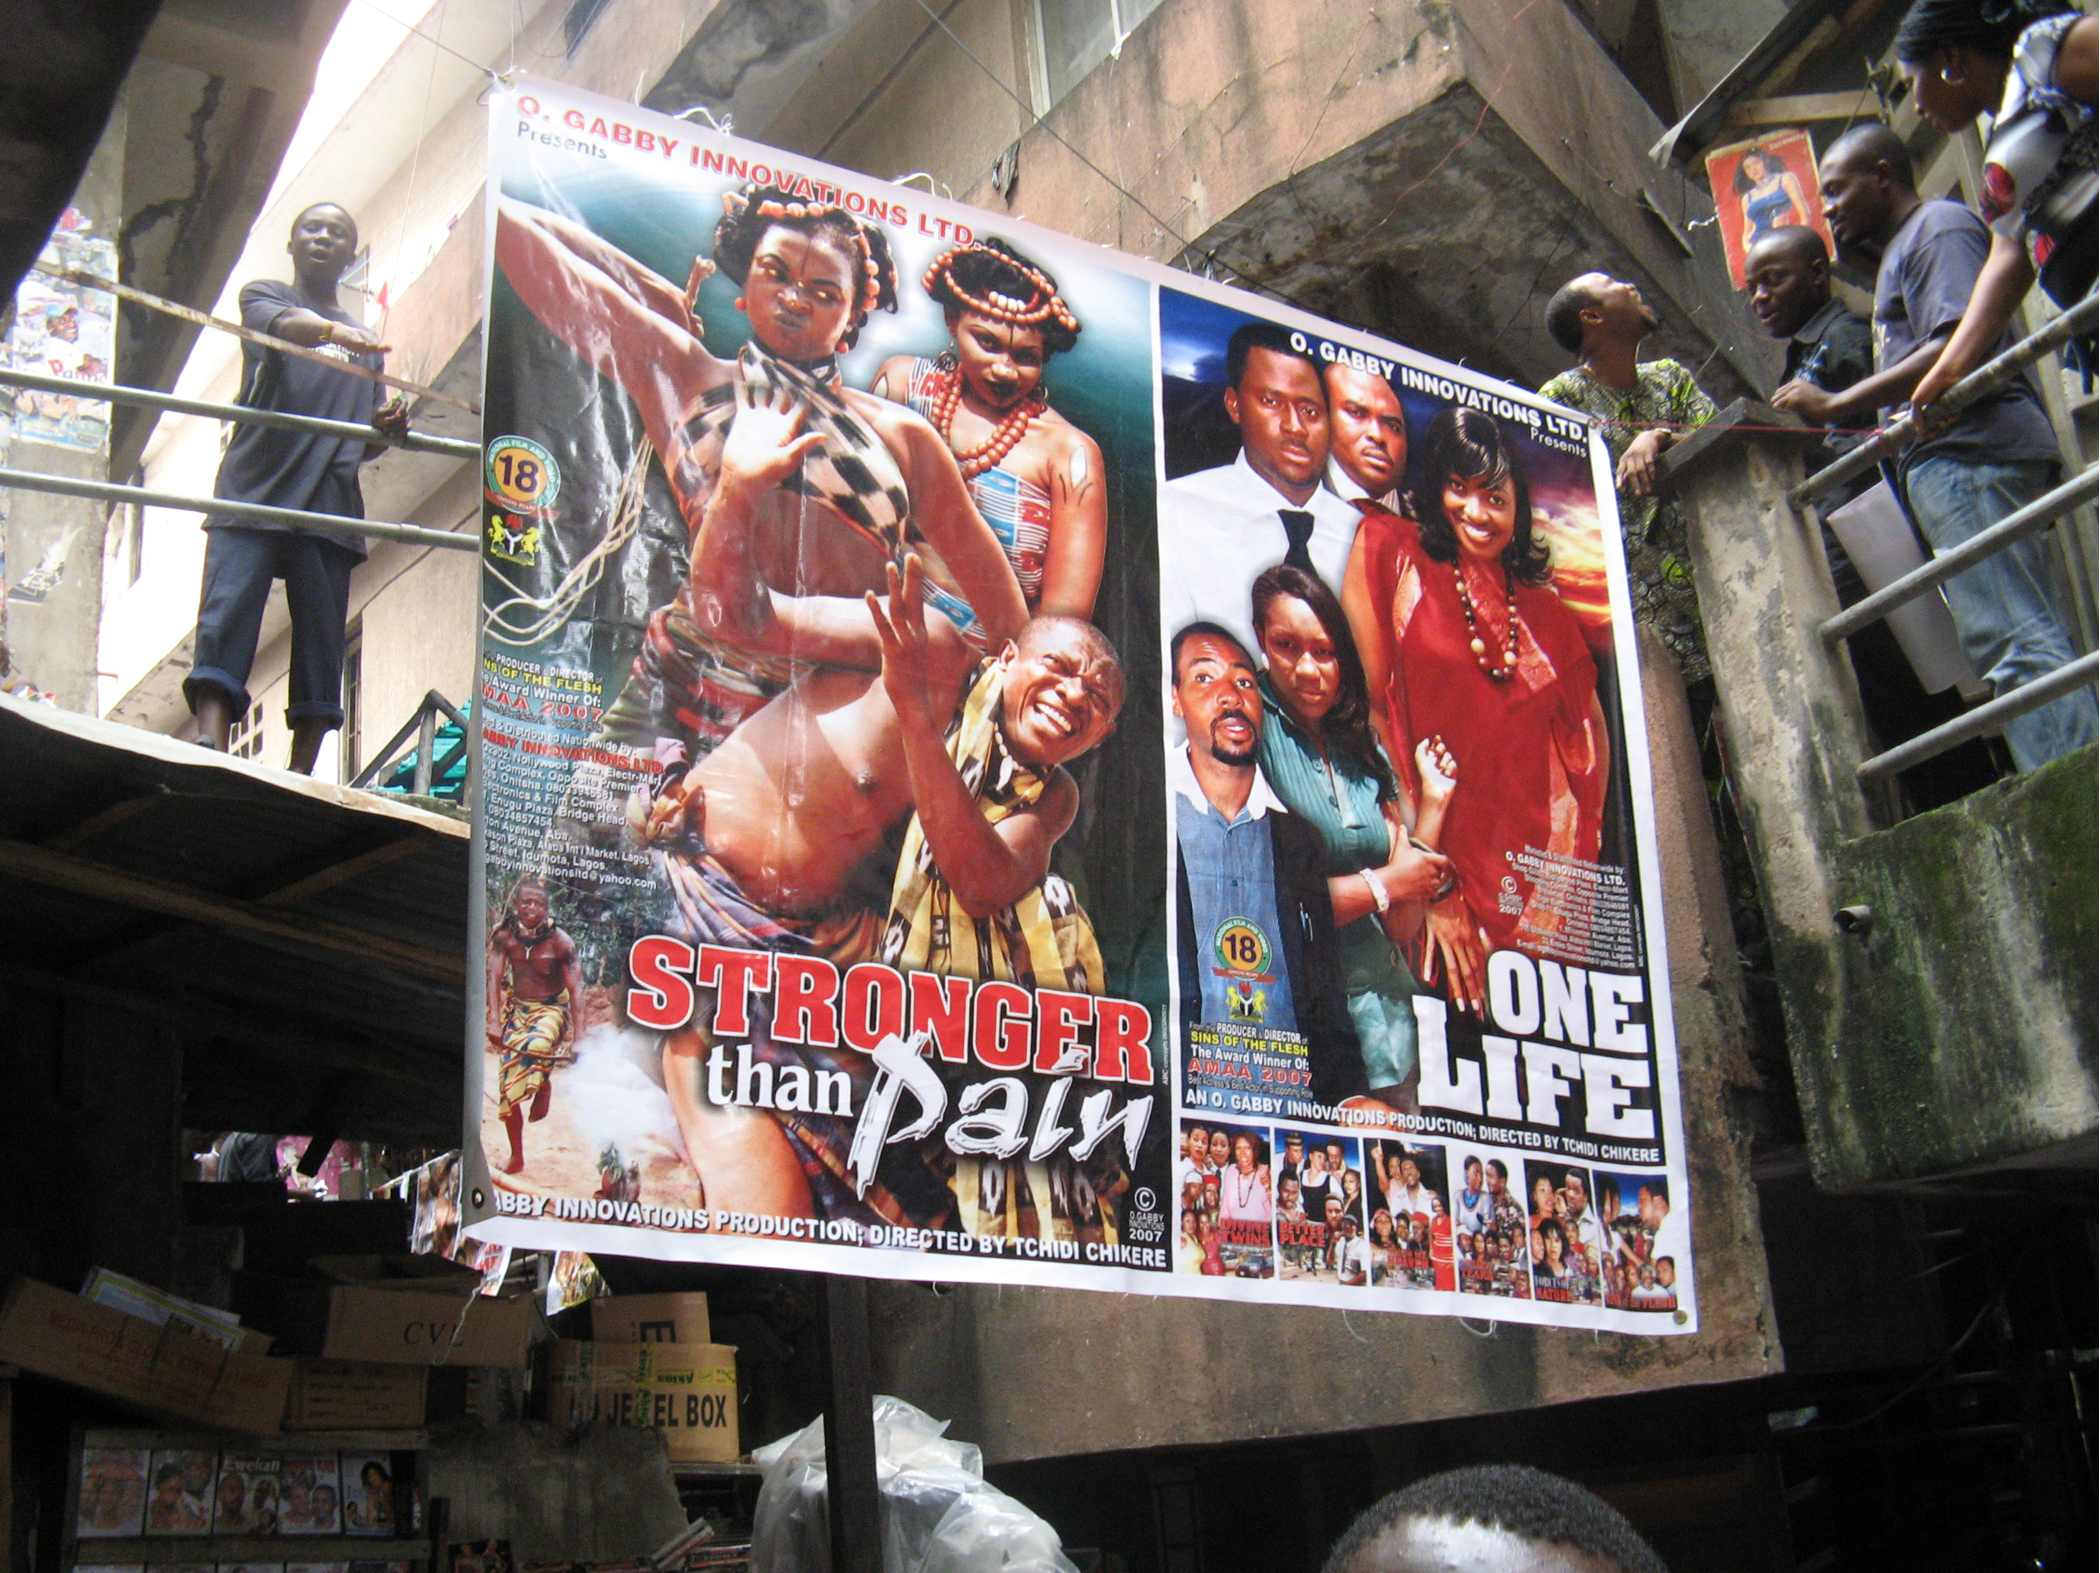 Nollywood  : le monde merveilleux du cinéma d'exploitation nigérian